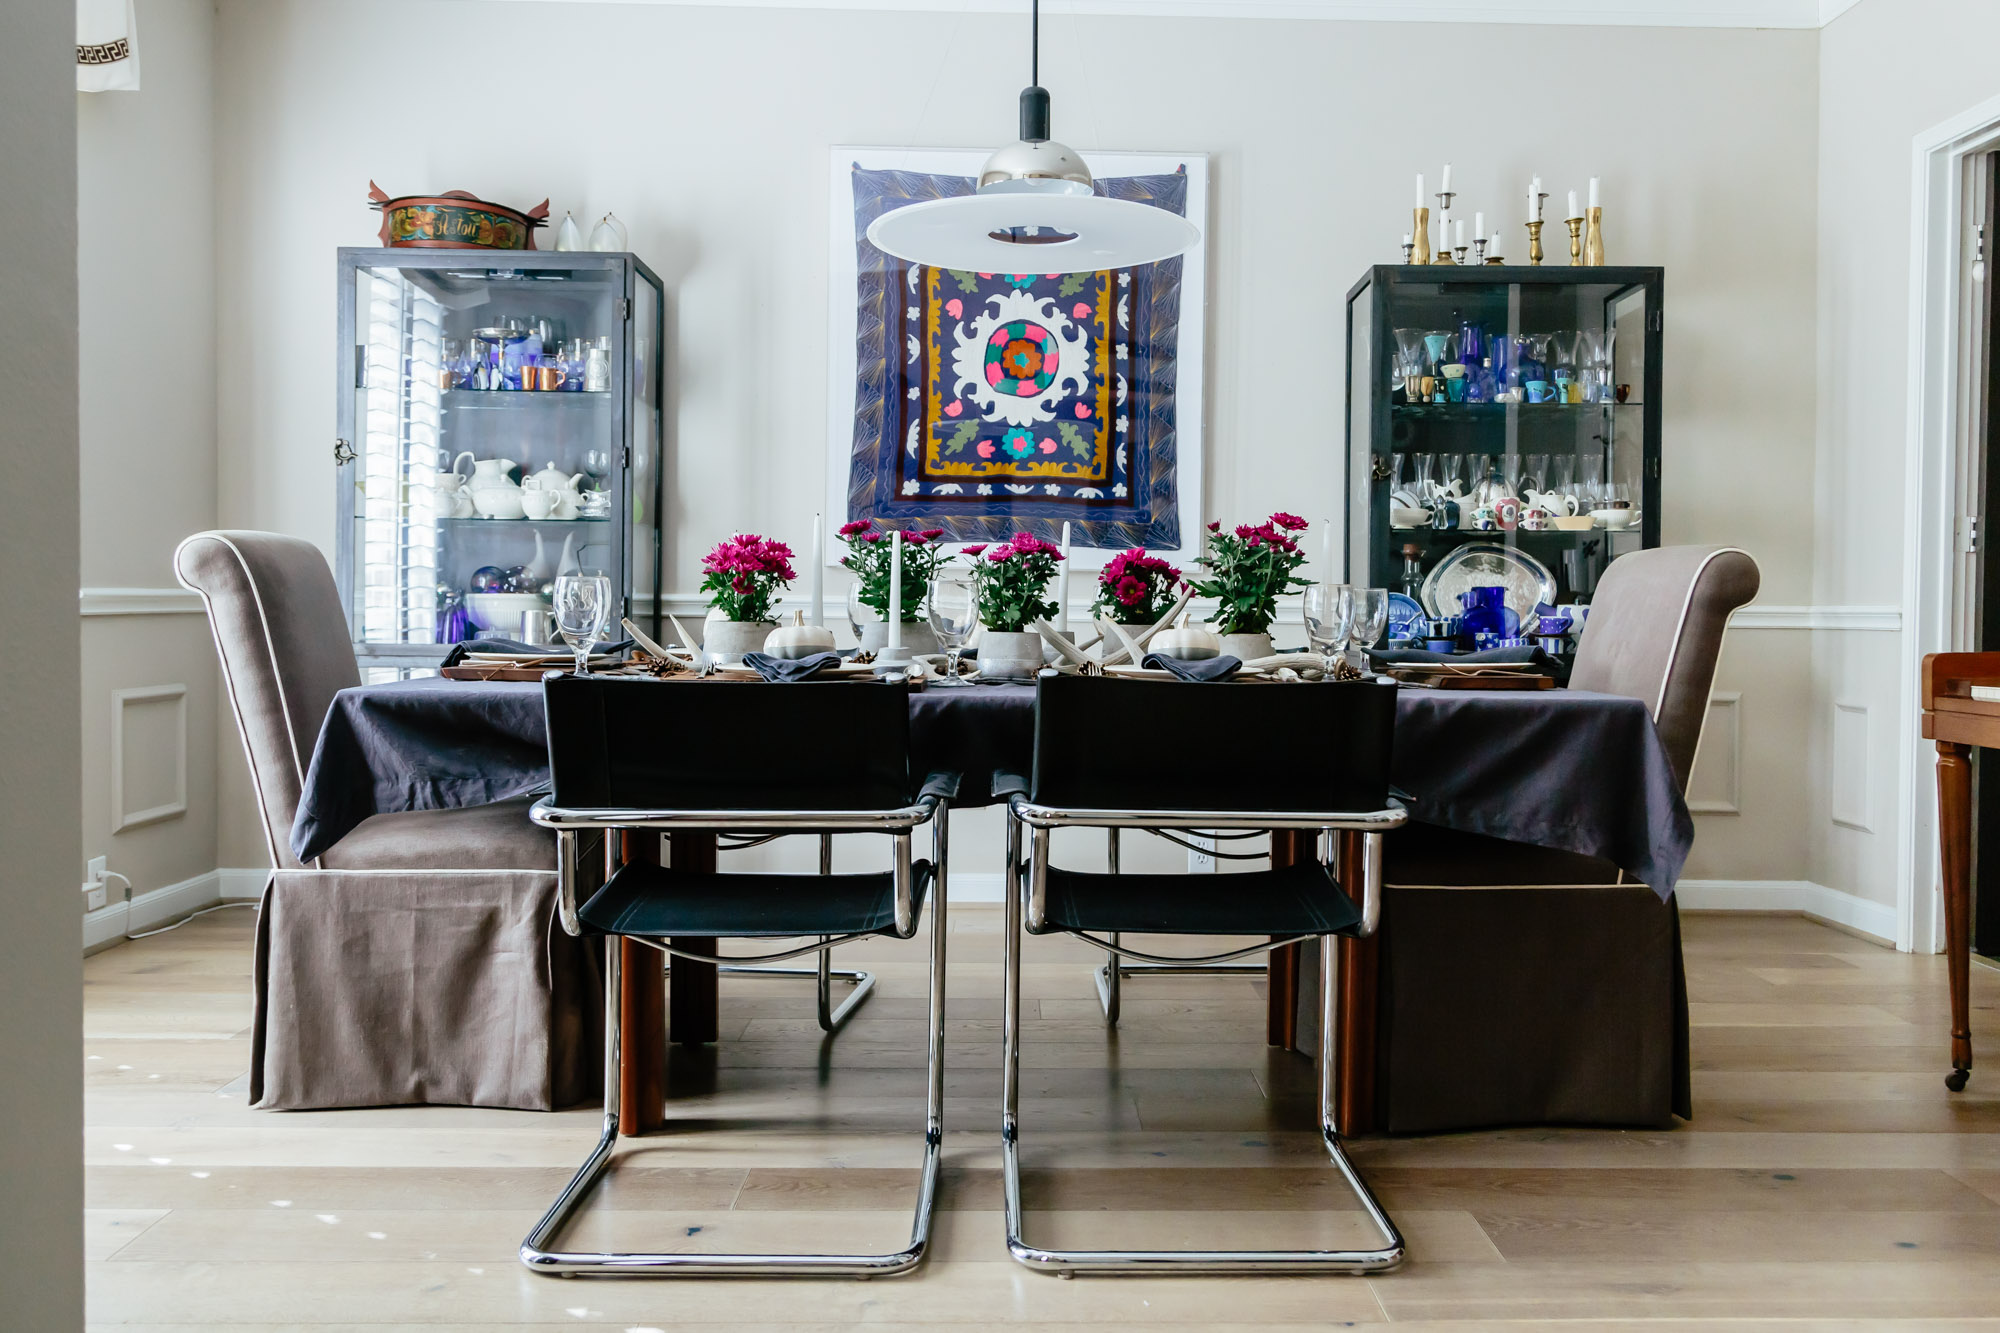 Dining room paint color change - Carla Aston, Designer | Tori Aston, Photographer